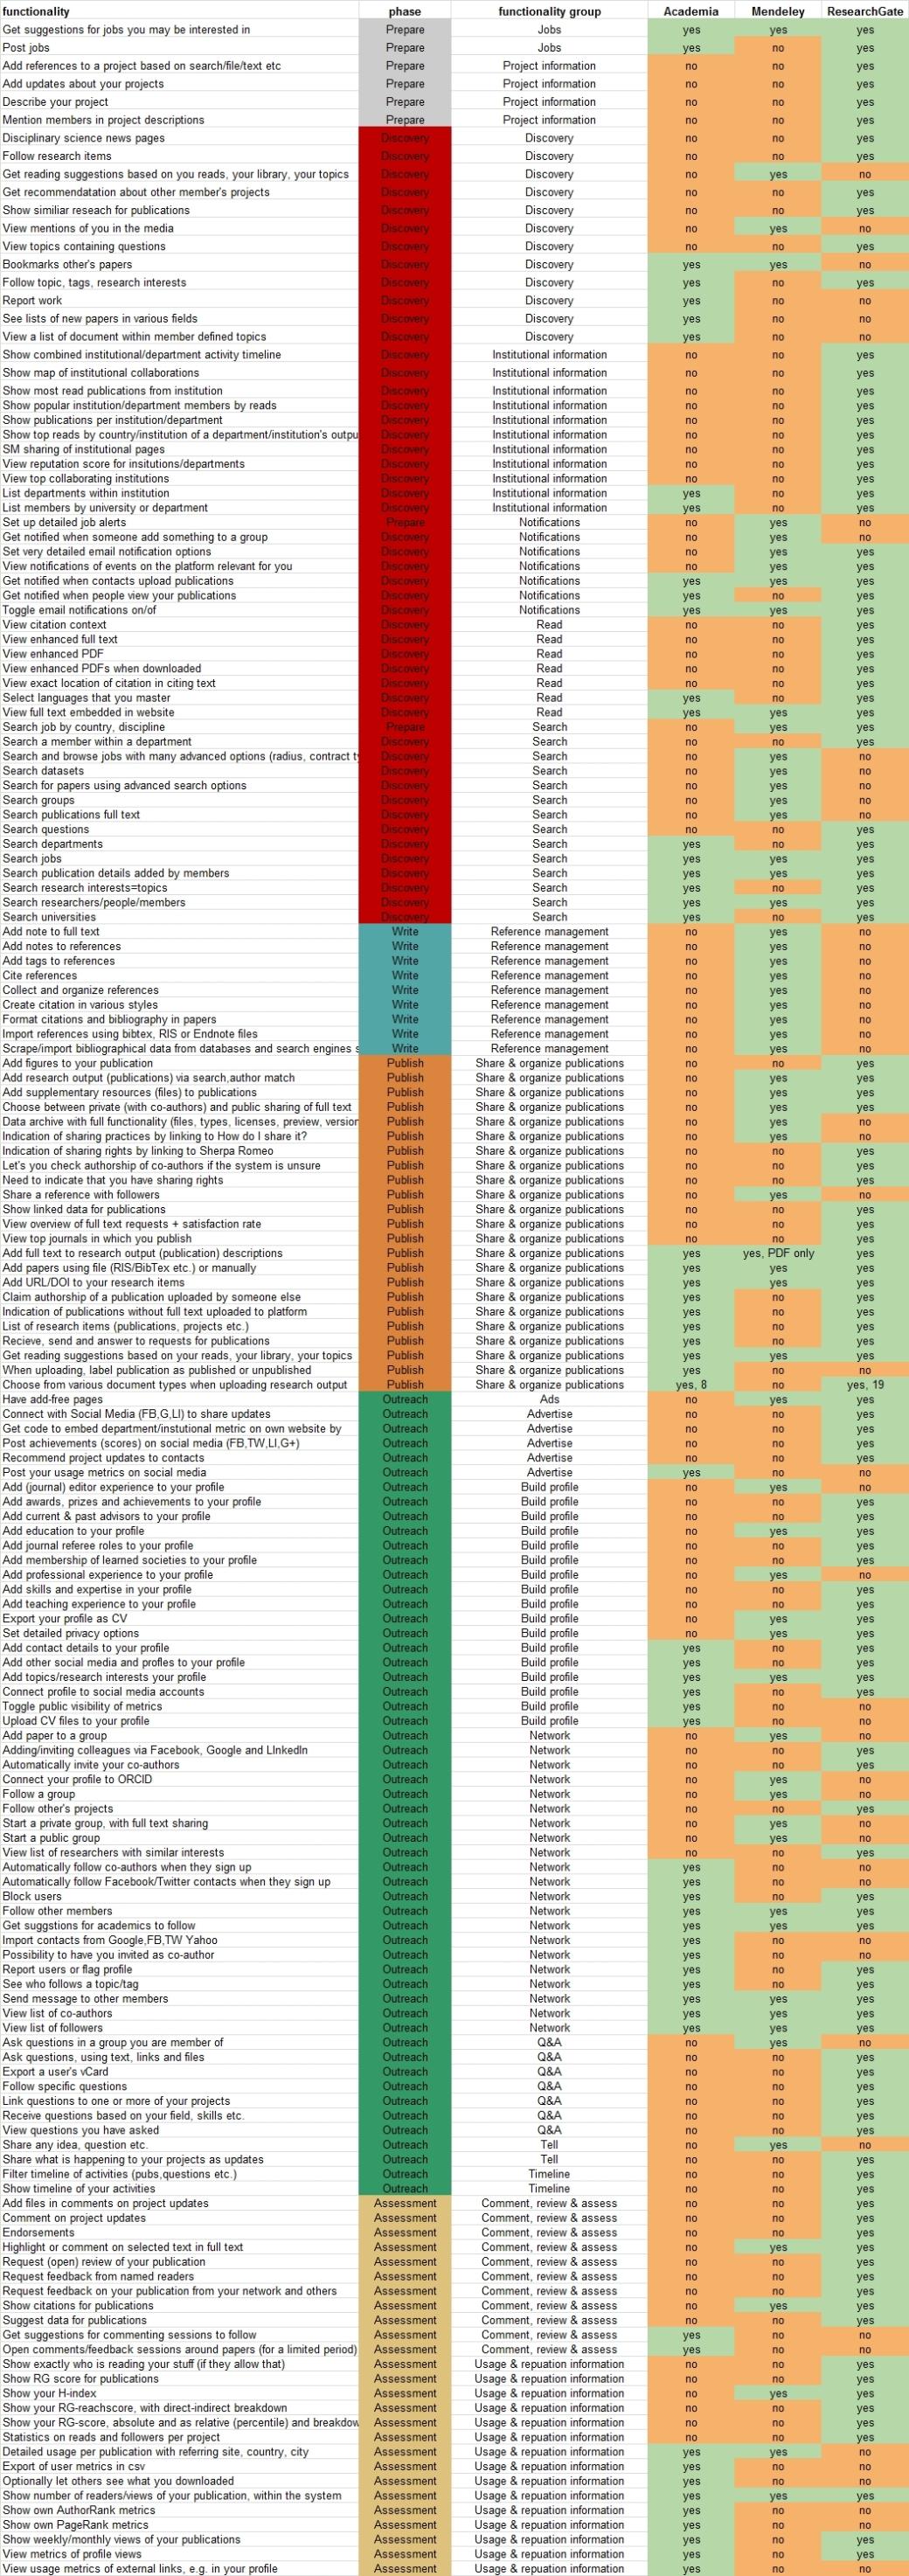 functionalities-list-total